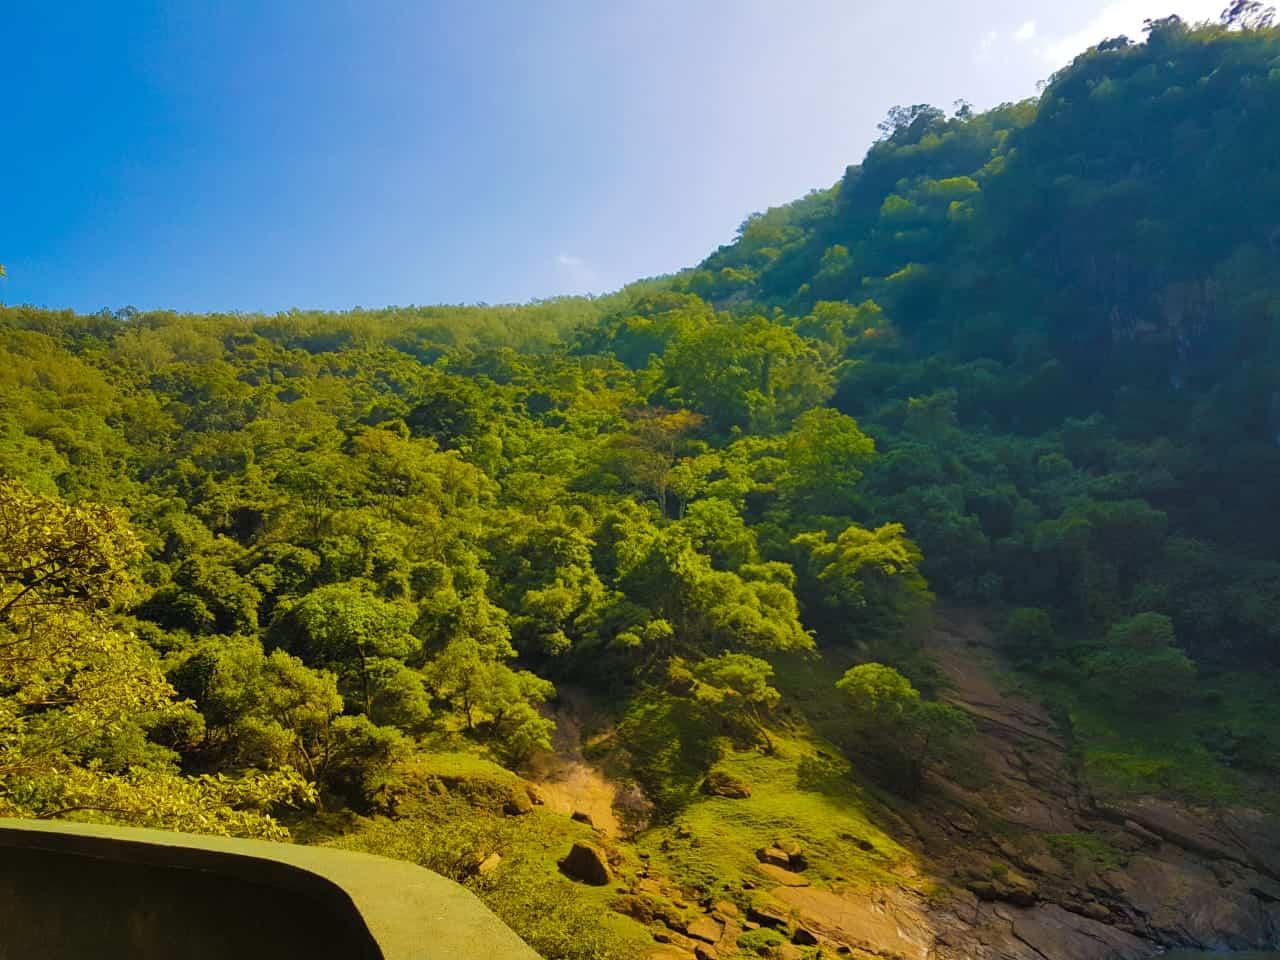 Dunhinda falls-wowtovisit-Sri lanka